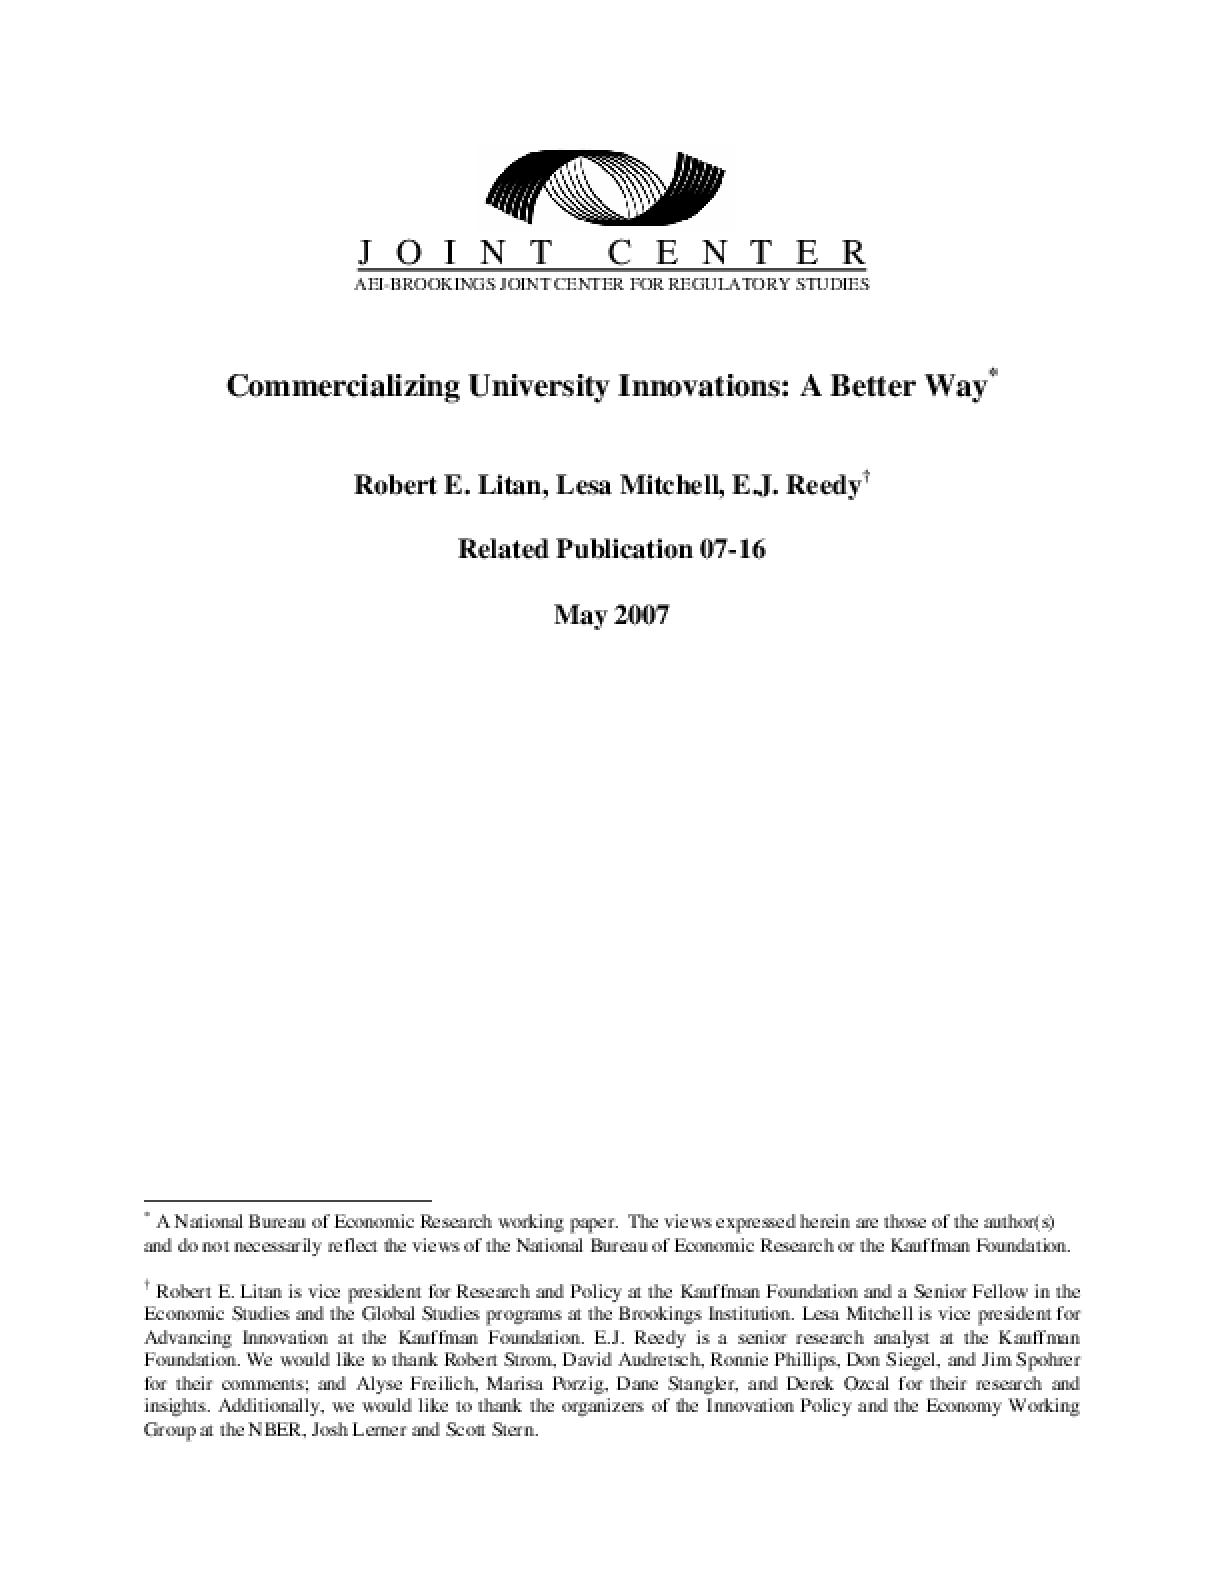 Commercializing University Innovations: A Better Way